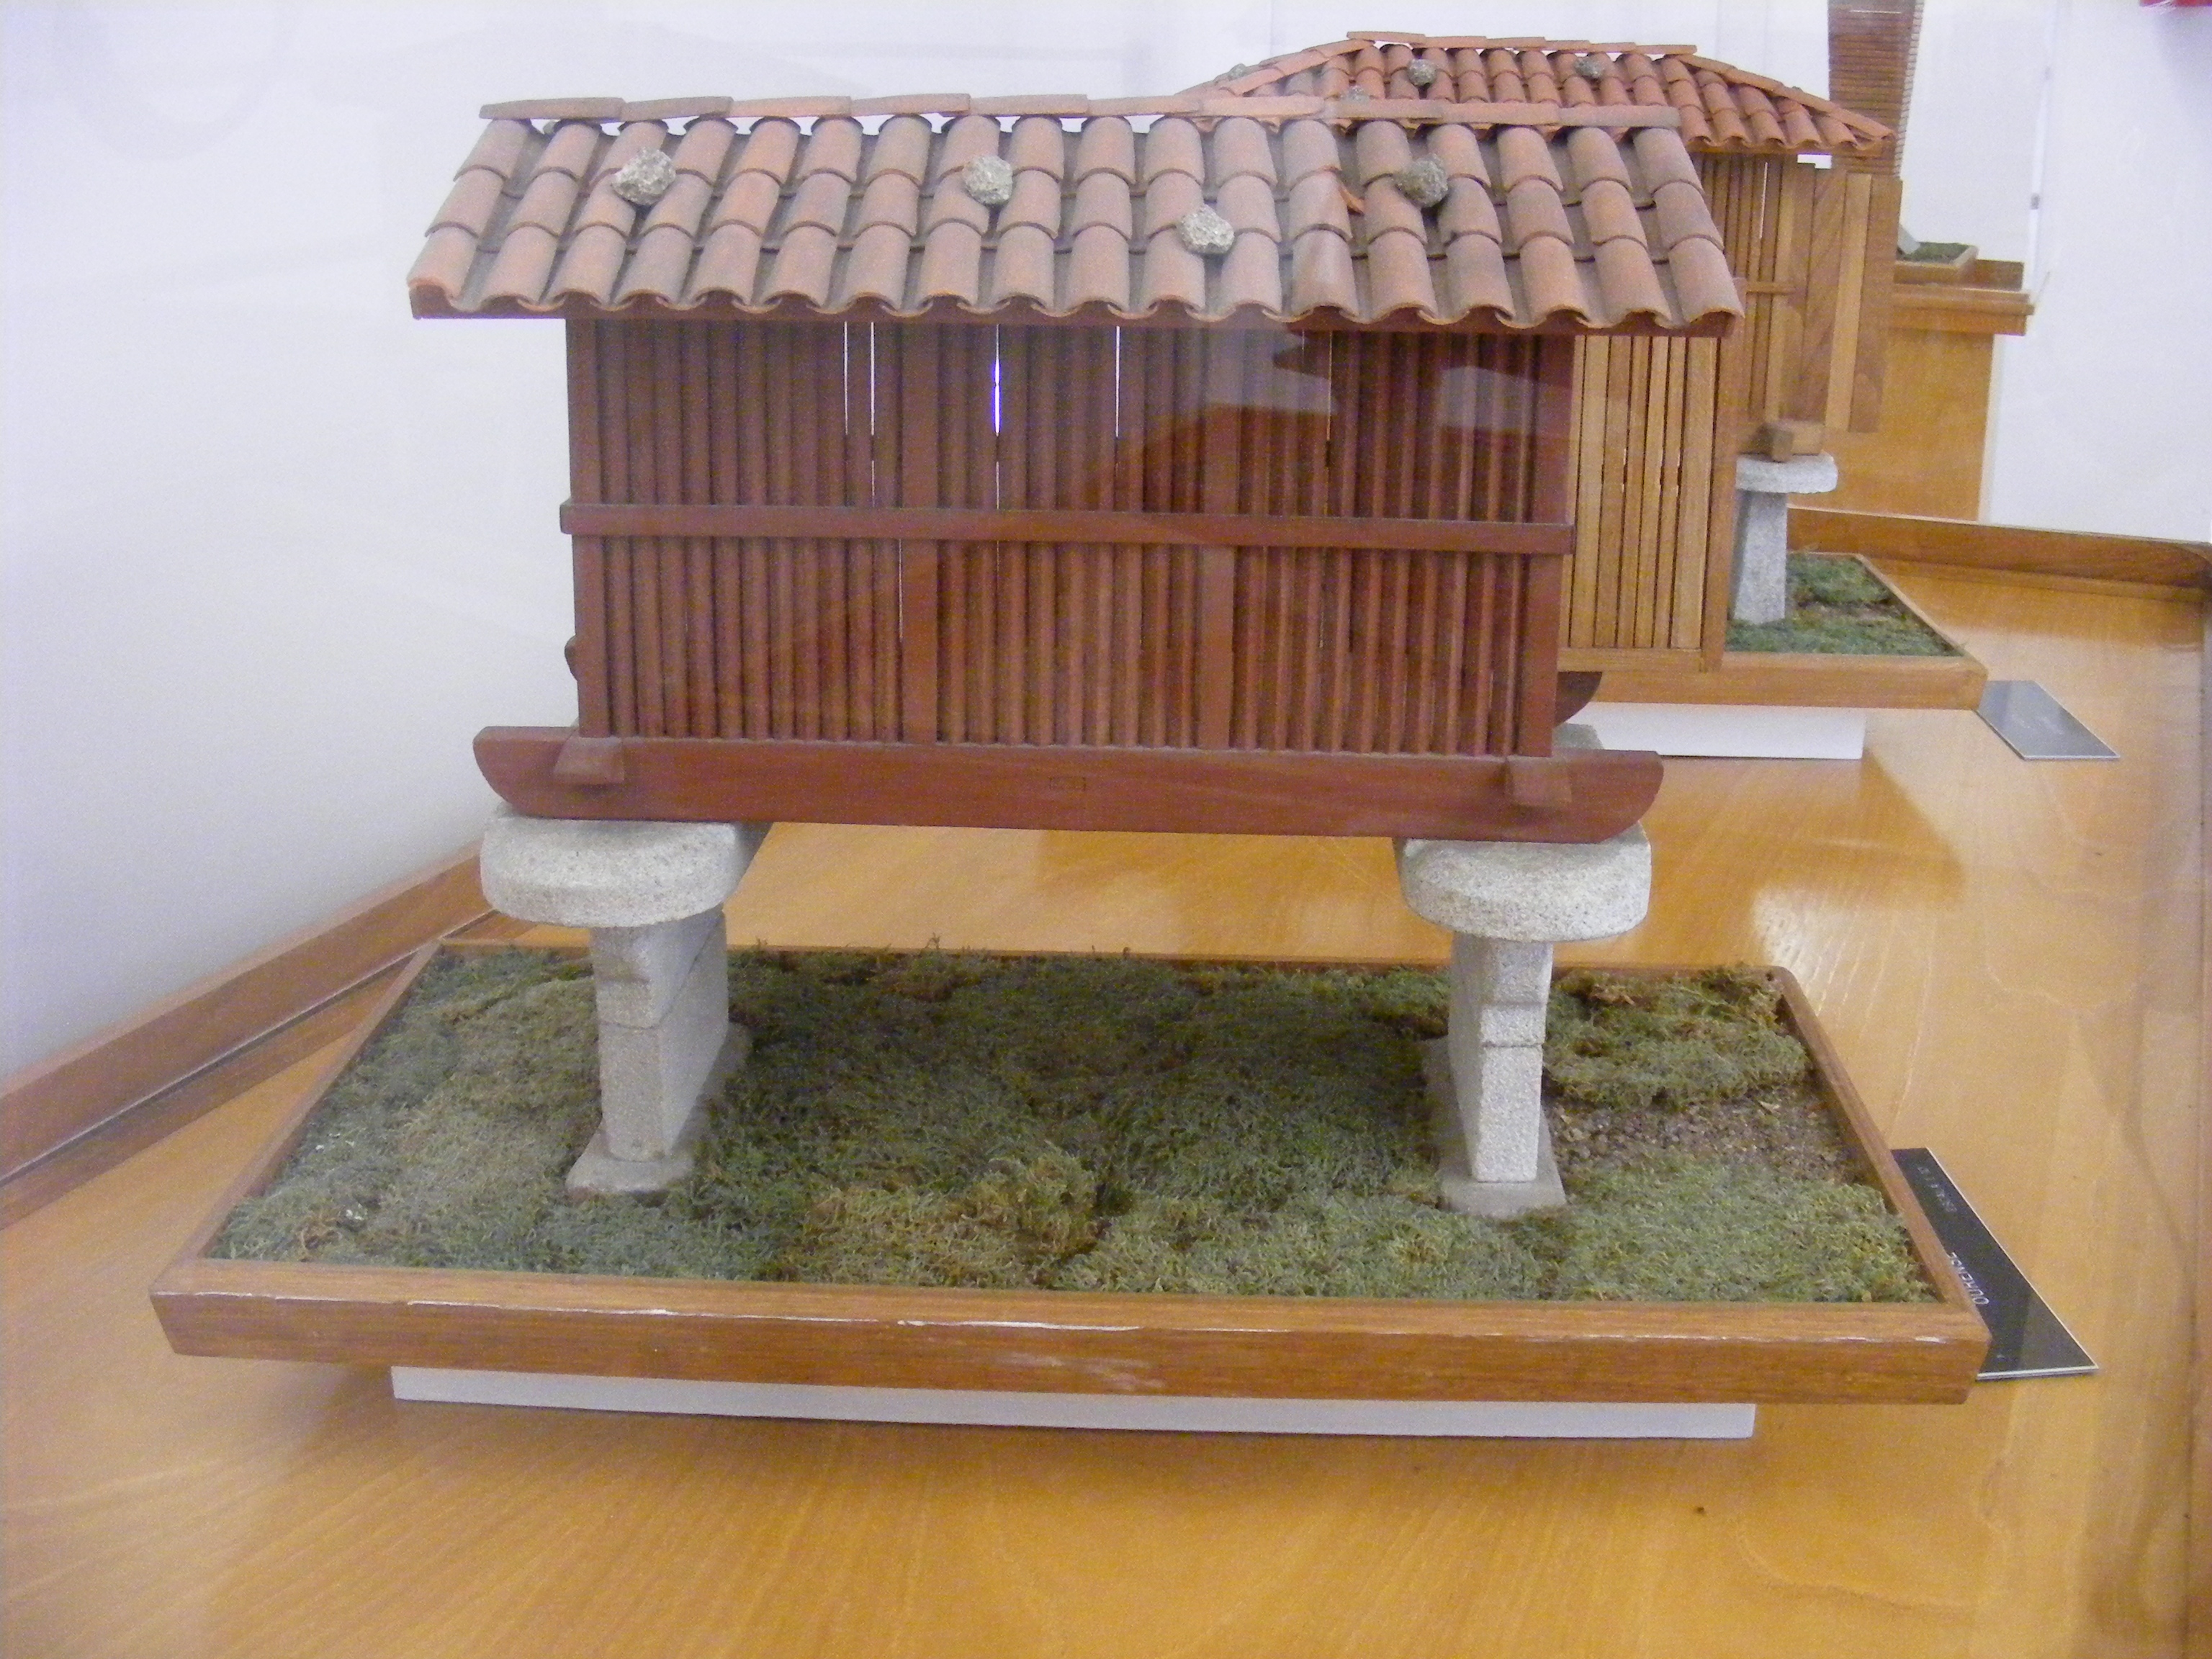 Estudios Hist Ricos Y Geneal Gicos Blog De Xos Ricardo  # Muebles Sieiro Lalin